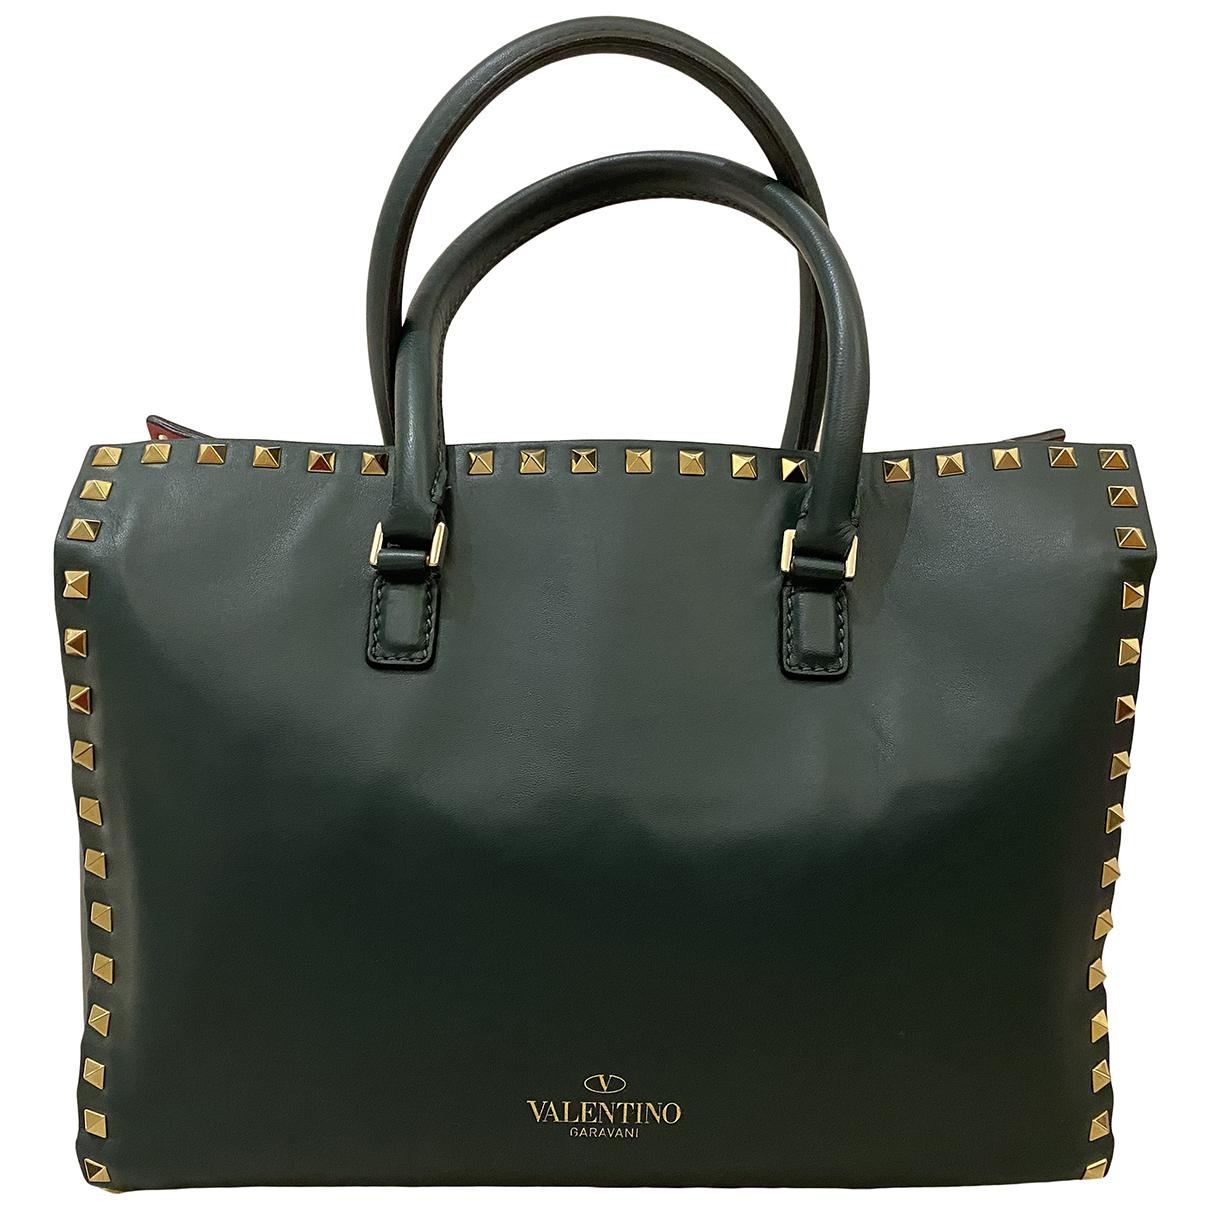 Valentino Garavani - Sac a main Rockstud pour femme en cuir - vert